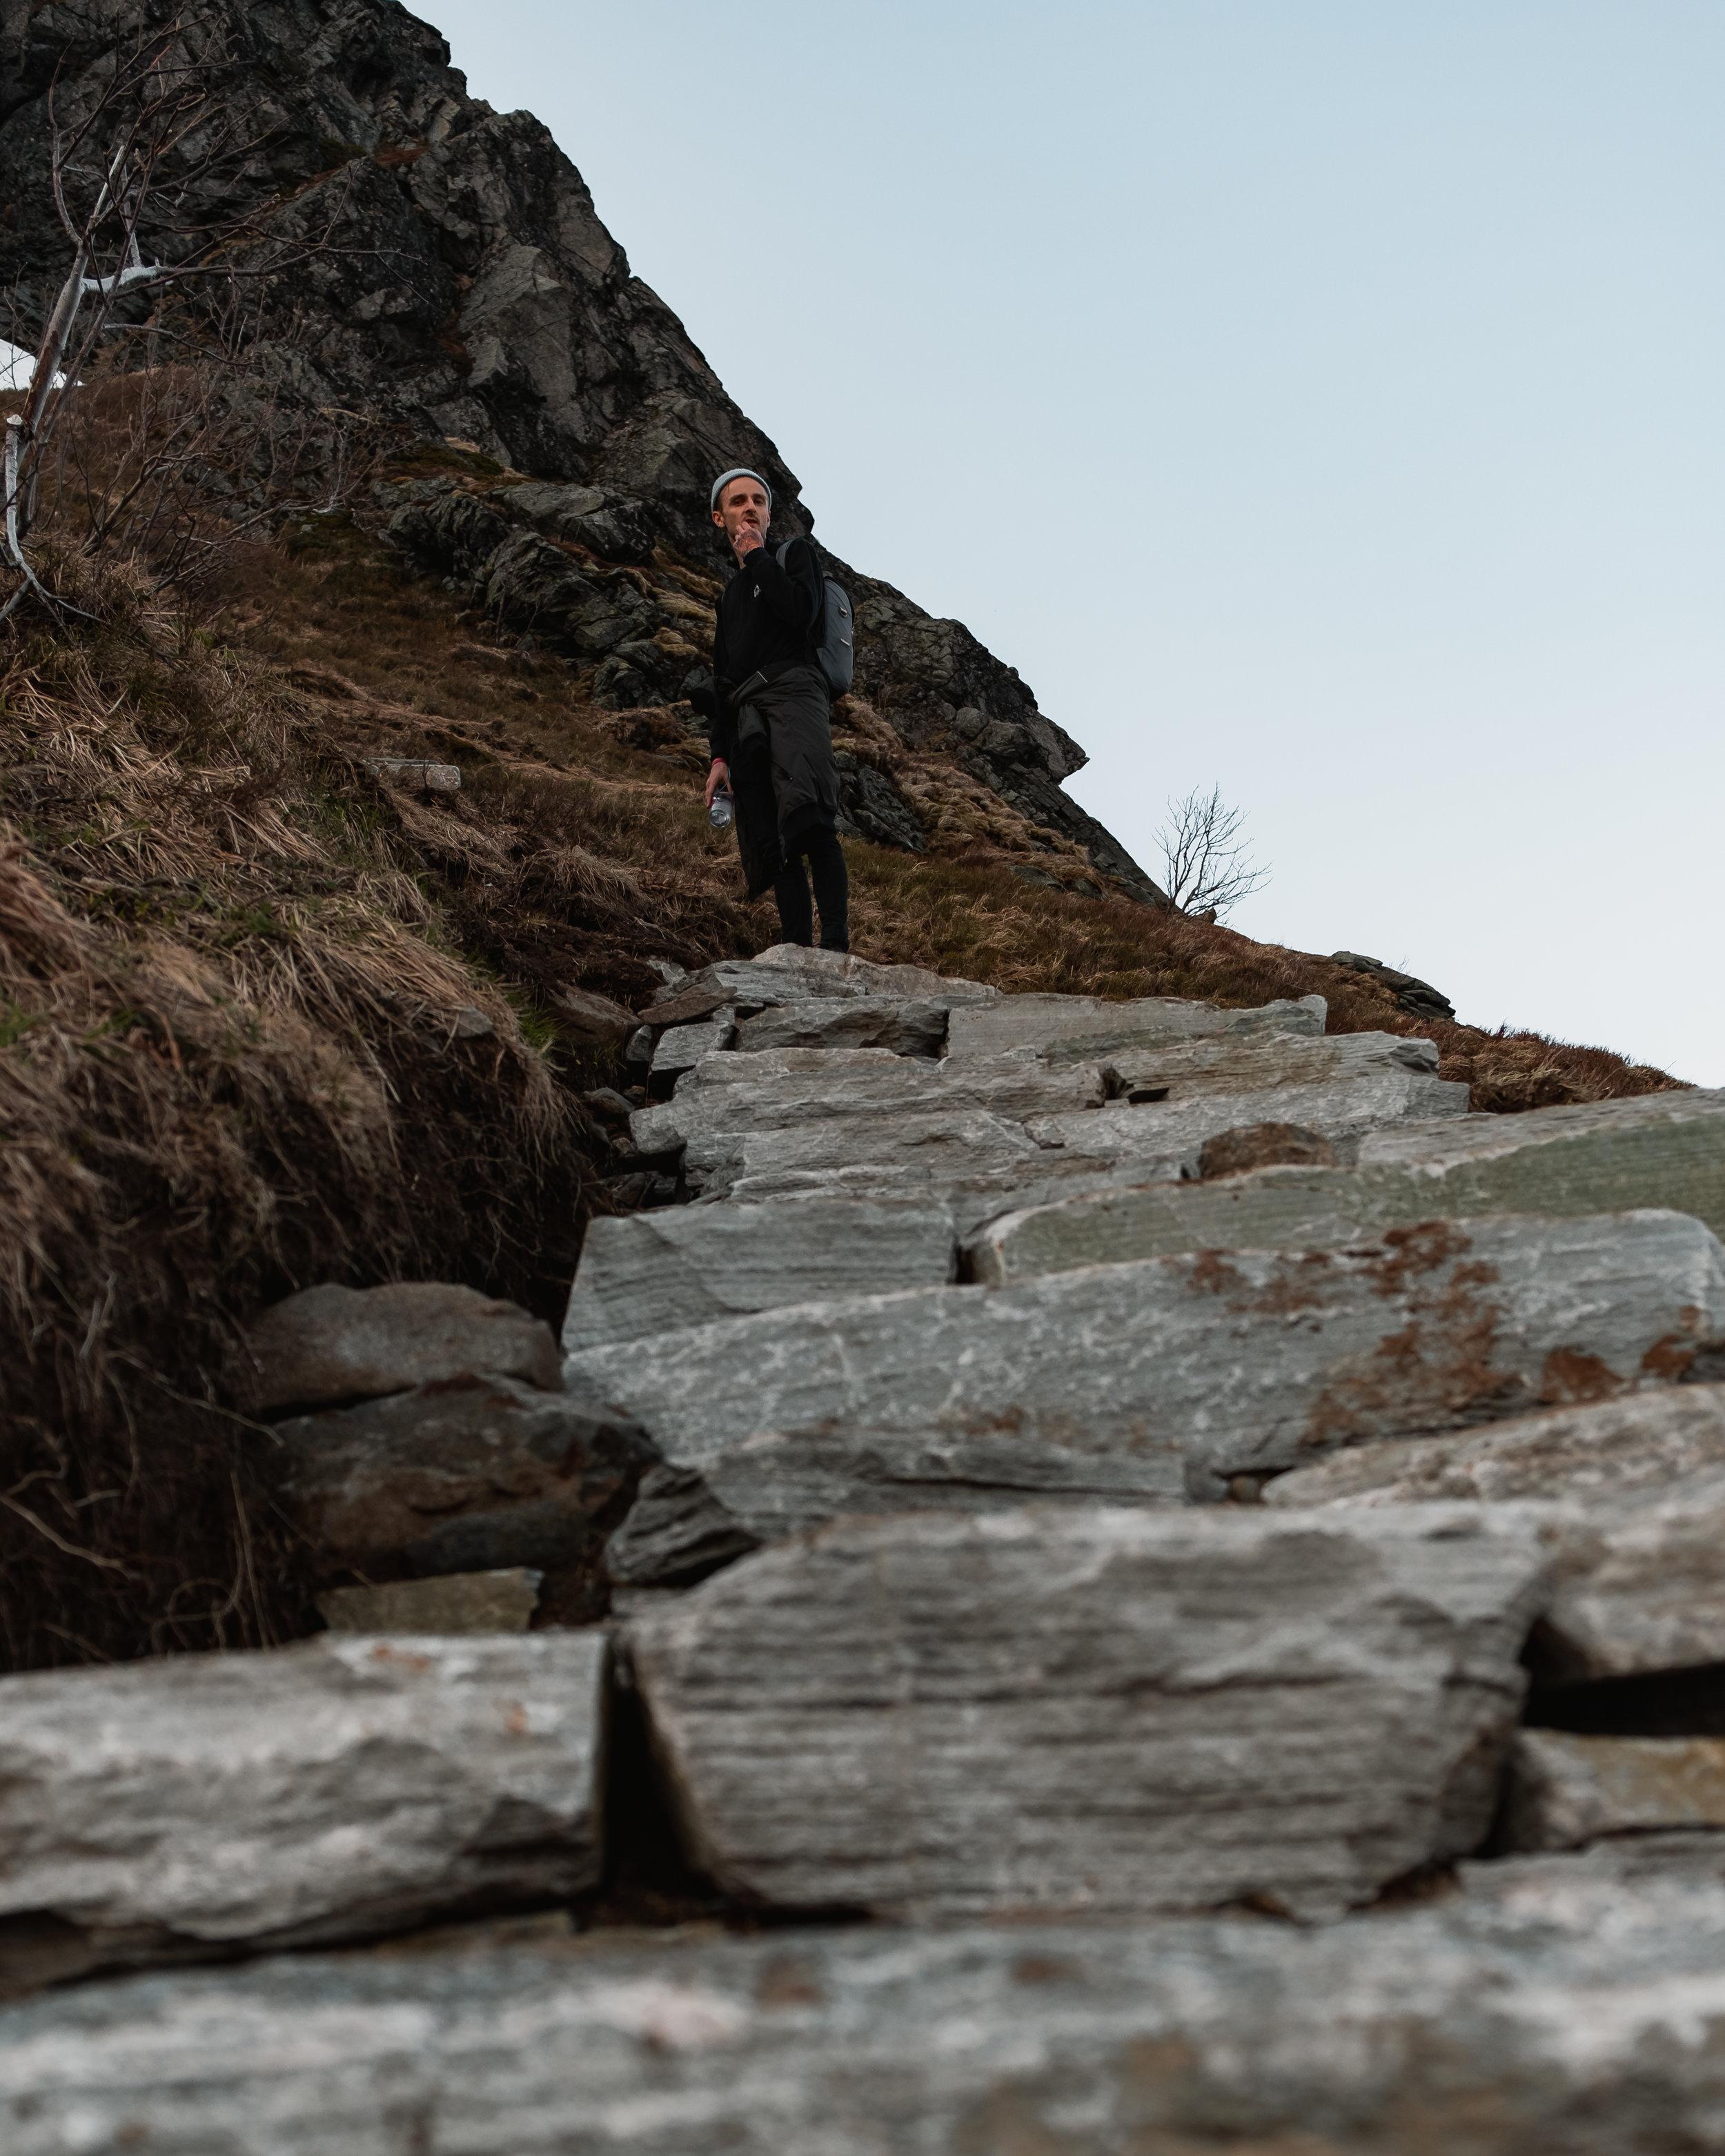 reinebringen+guide+lofoten+hike